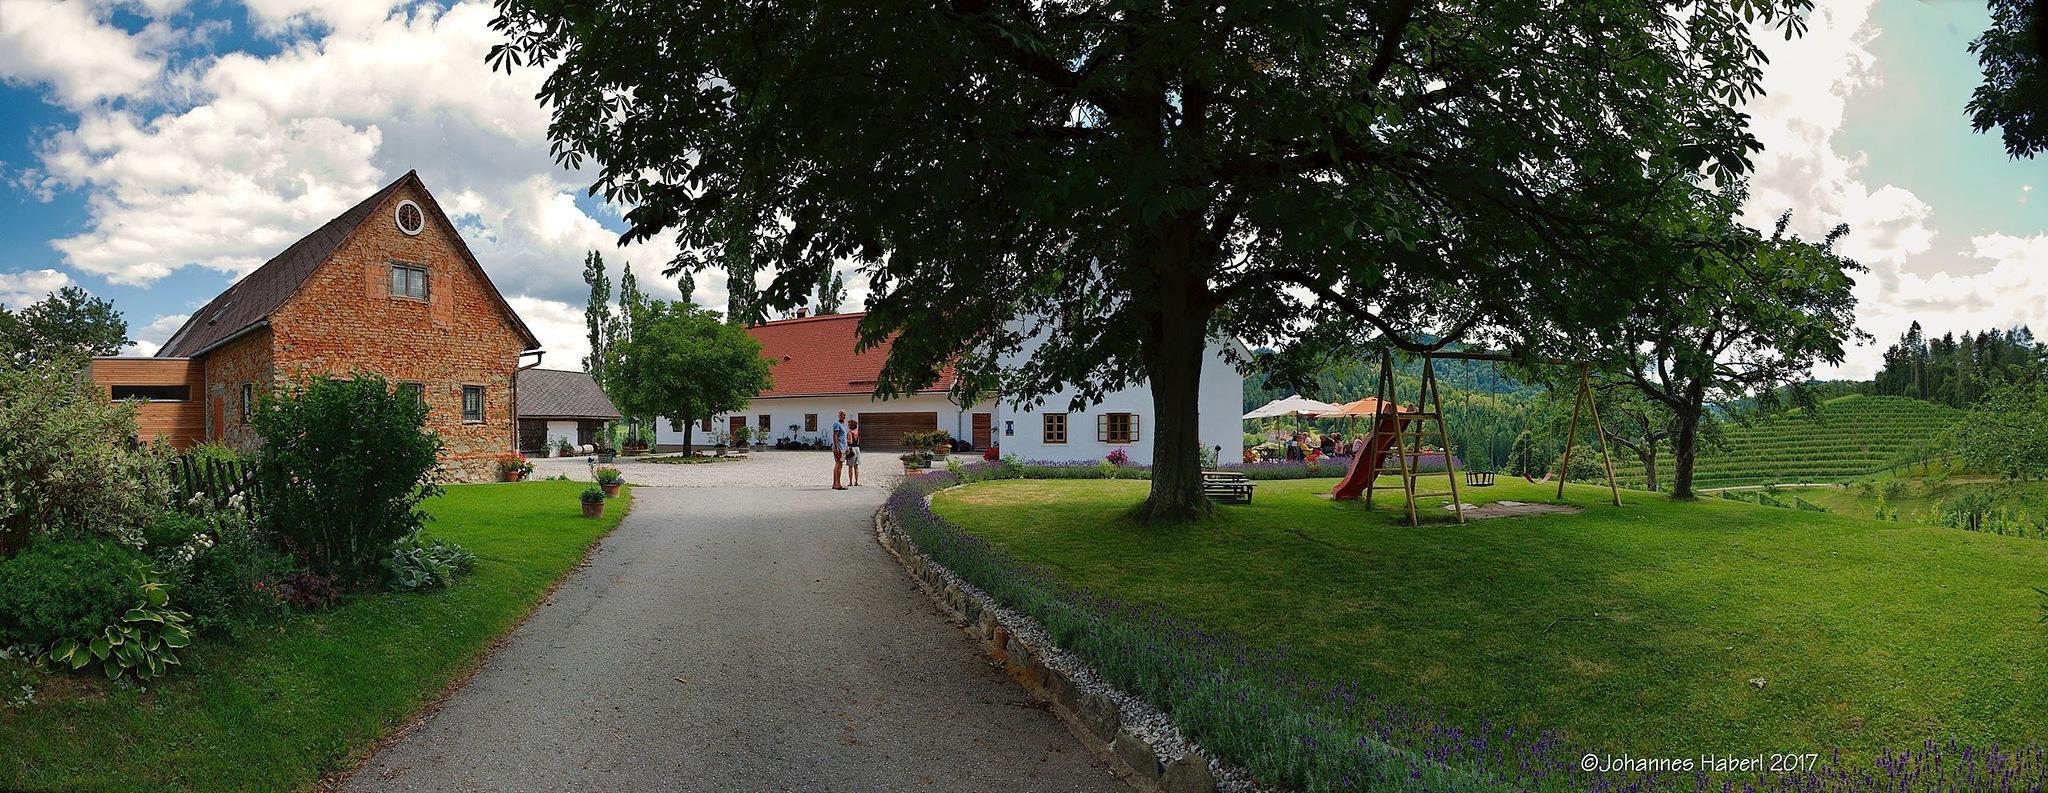 """Buschenschank"" Oberguess - panorama by Johannes Haberl"